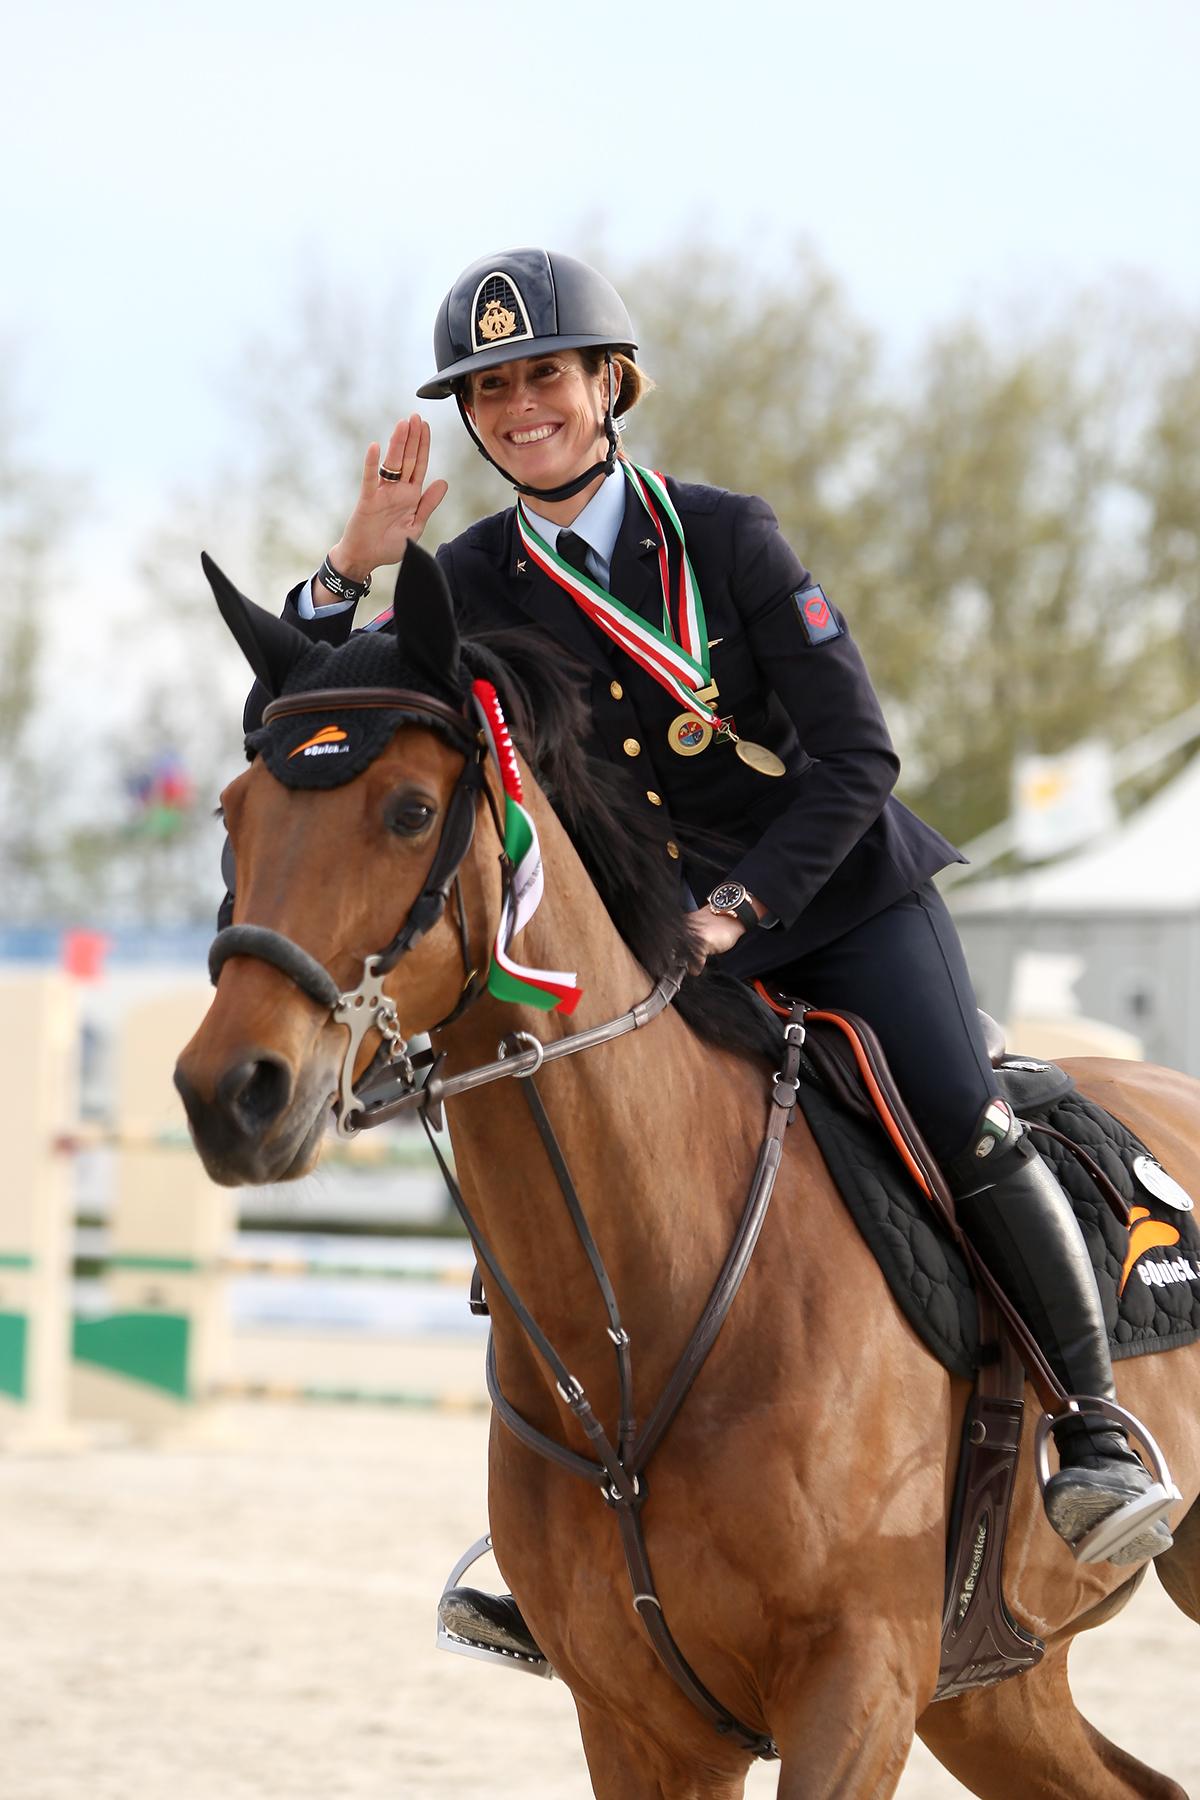 Giulia Martinengo Campionesse 2018